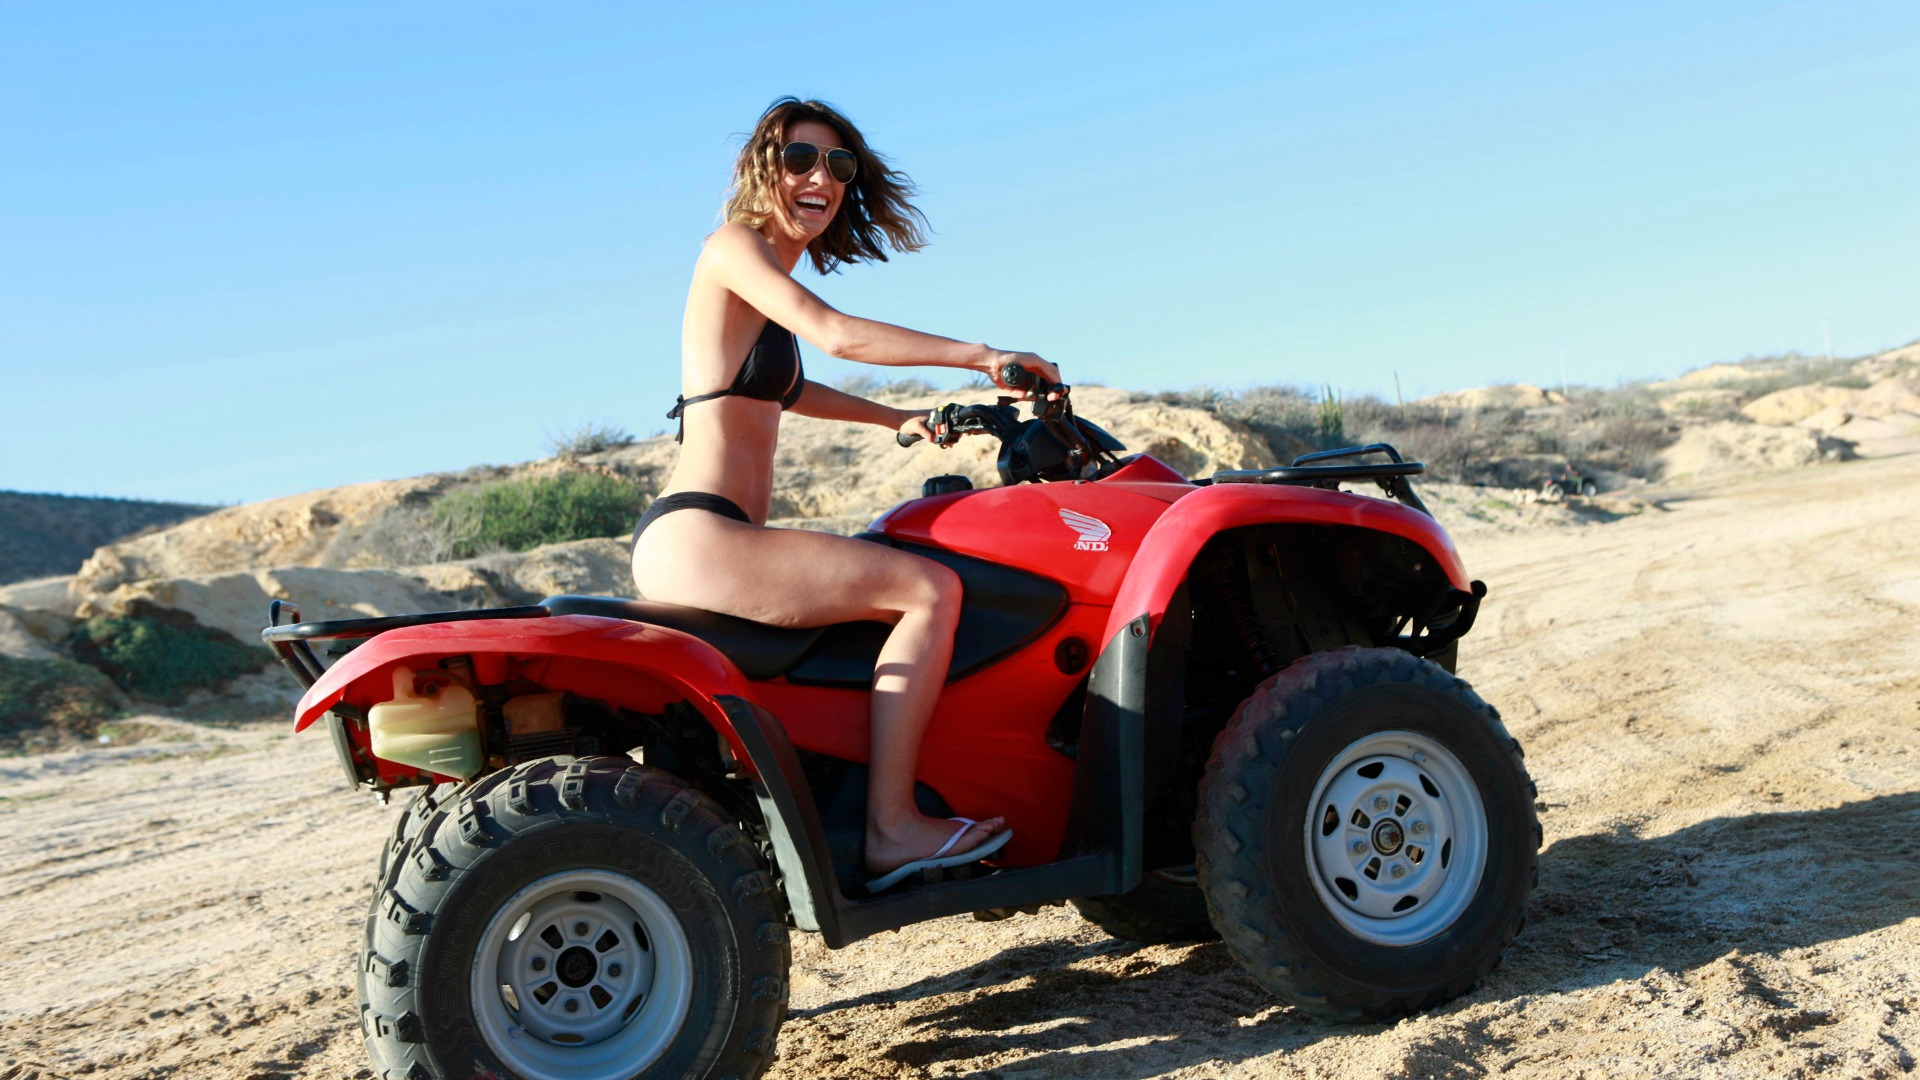 Jacqueline MacInnes Wood hopped on a four-wheeler in sunny Cabo San Lucas, Mexico.